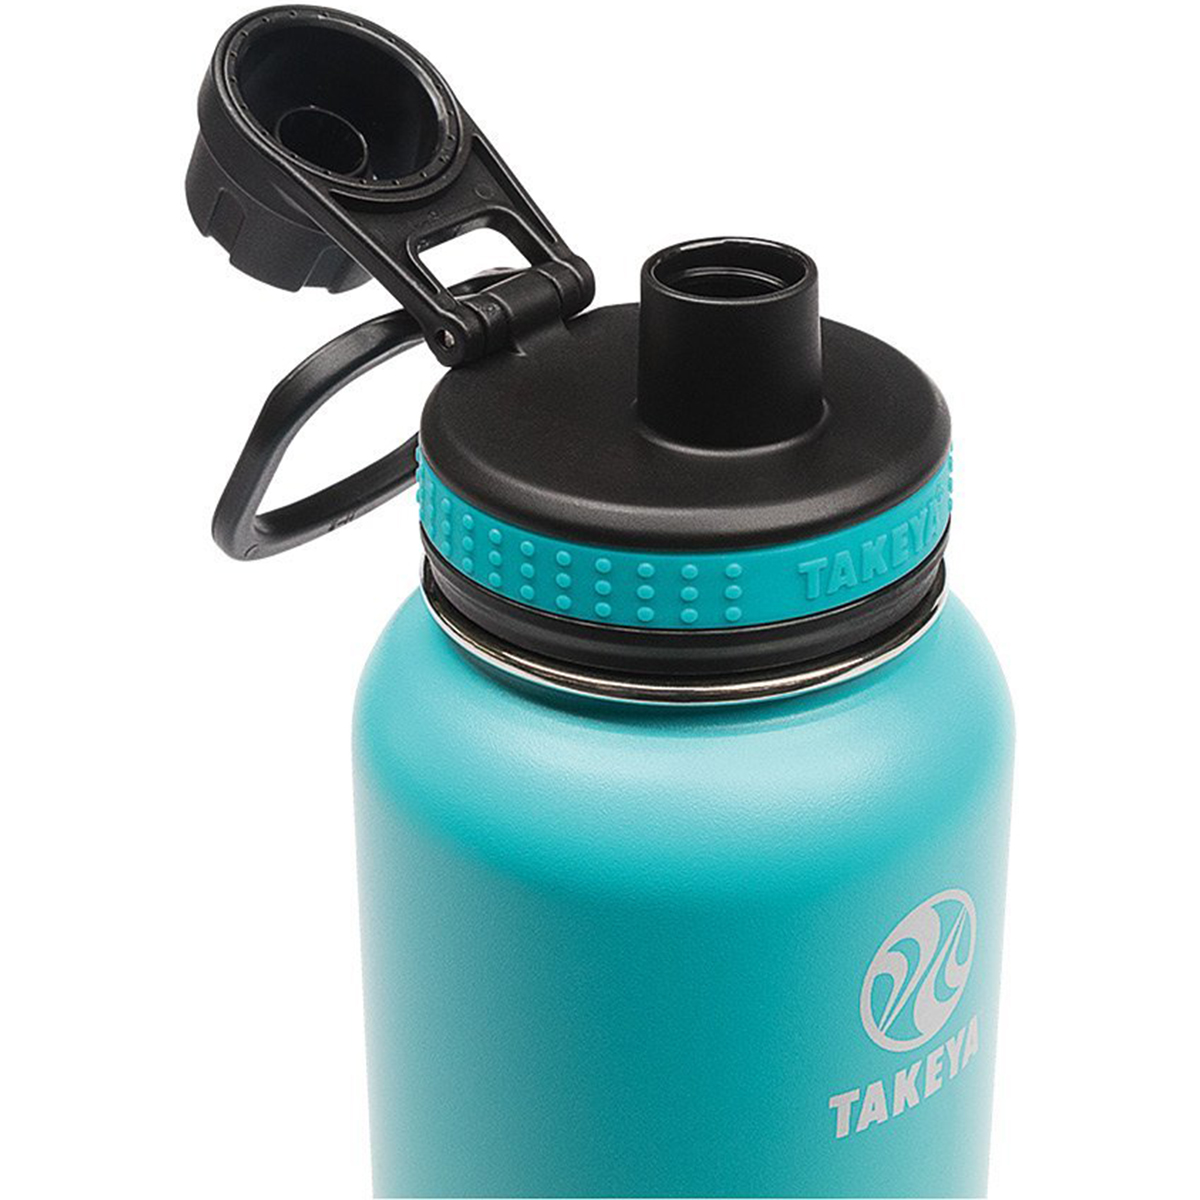 Takeya-Originals-32-oz-Insulated-Stainless-Steel-Water-Bottle thumbnail 14